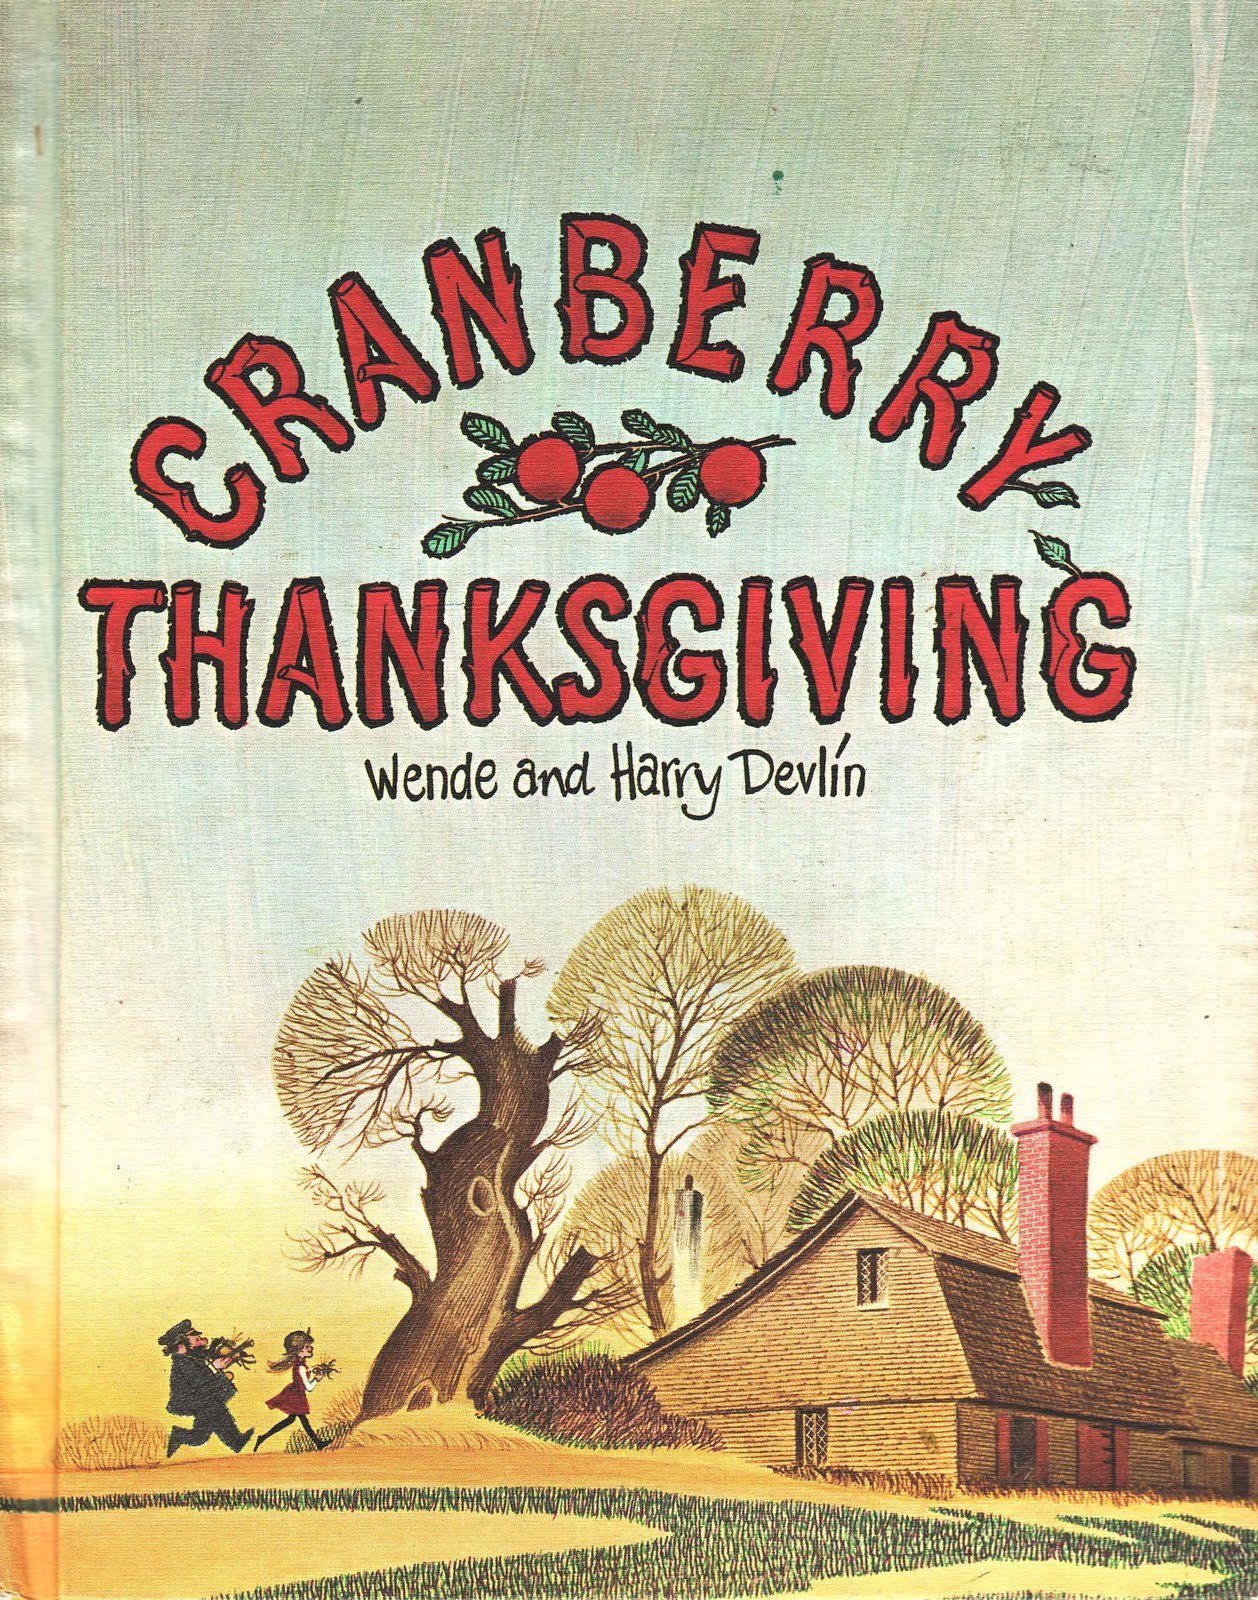 Vintage Kids\' Books My Kid Loves: Cranberry Thanksgiving